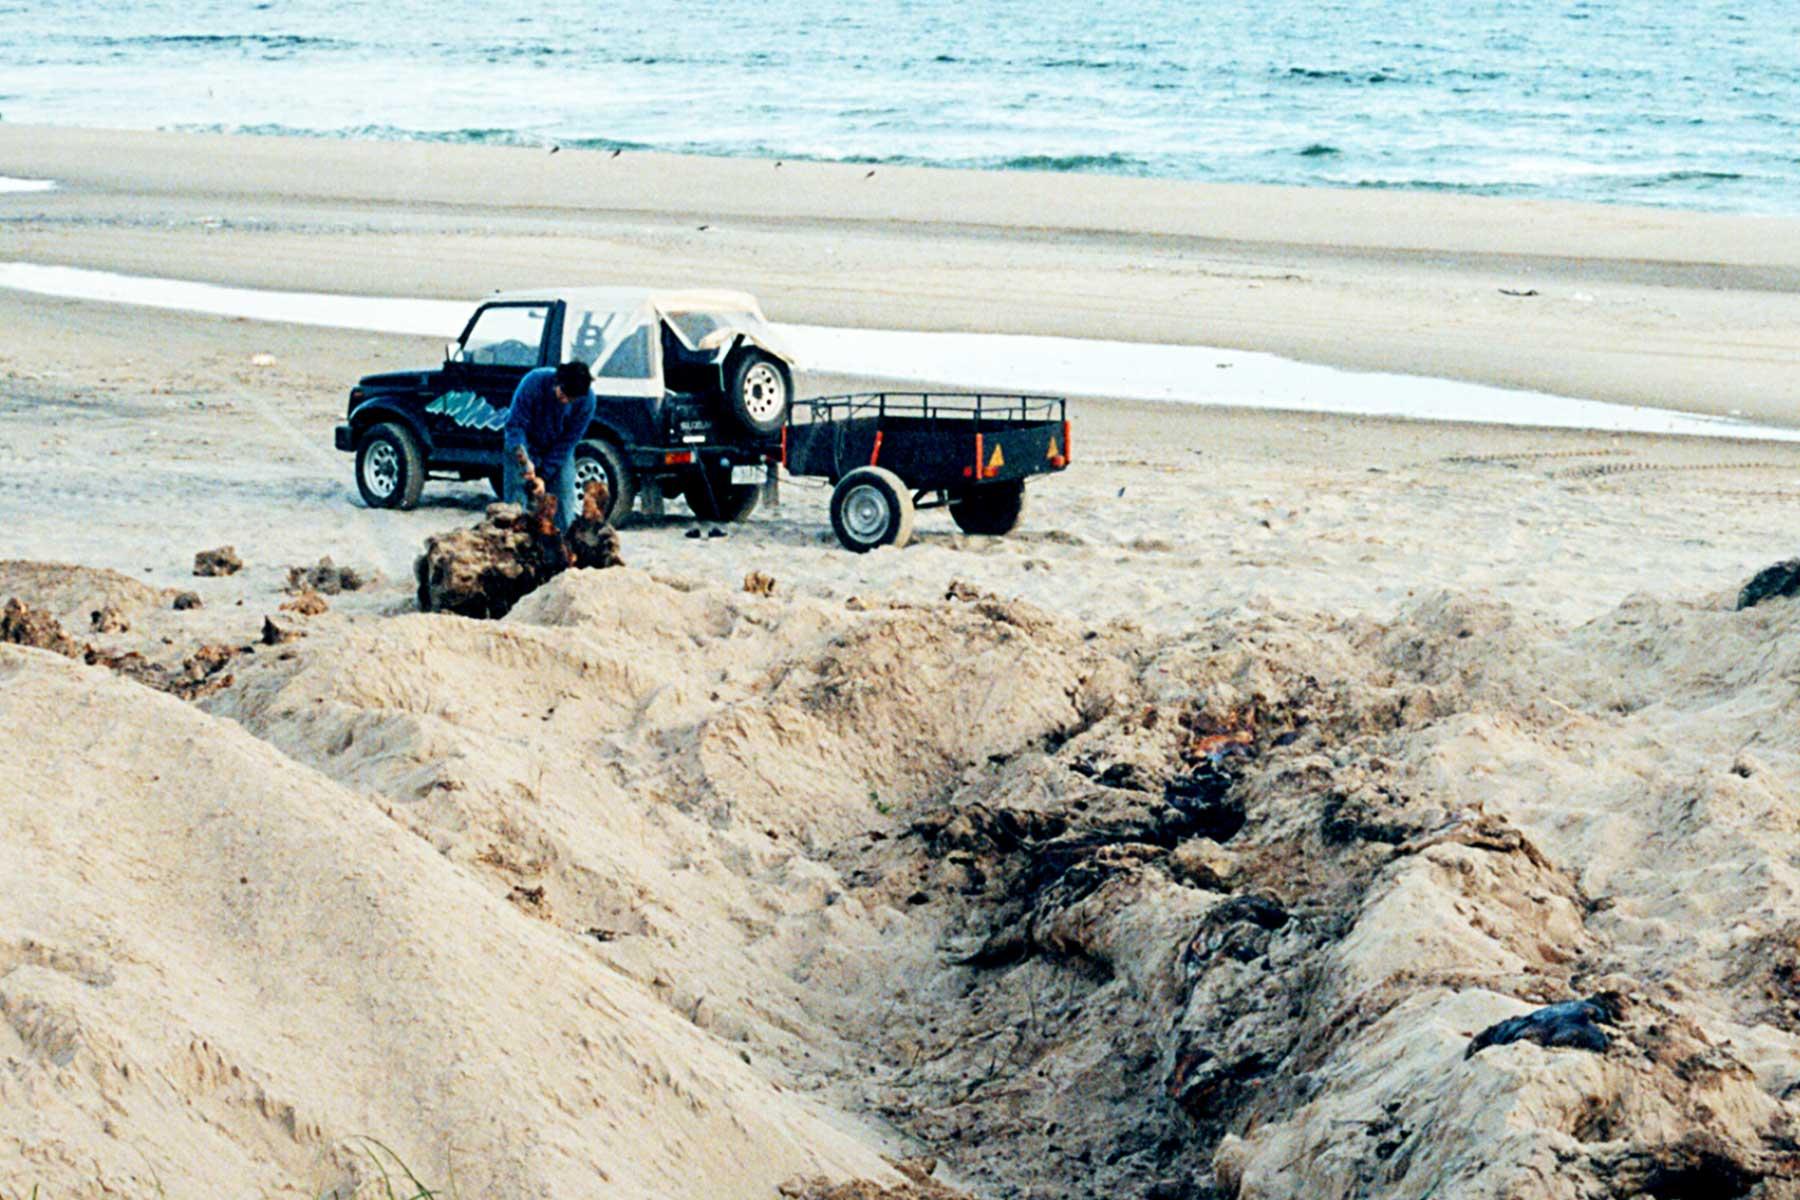 Uruguay | Whale Research | Steven Andrew Martin | South America | Travel Journal | Dr Steven Martin